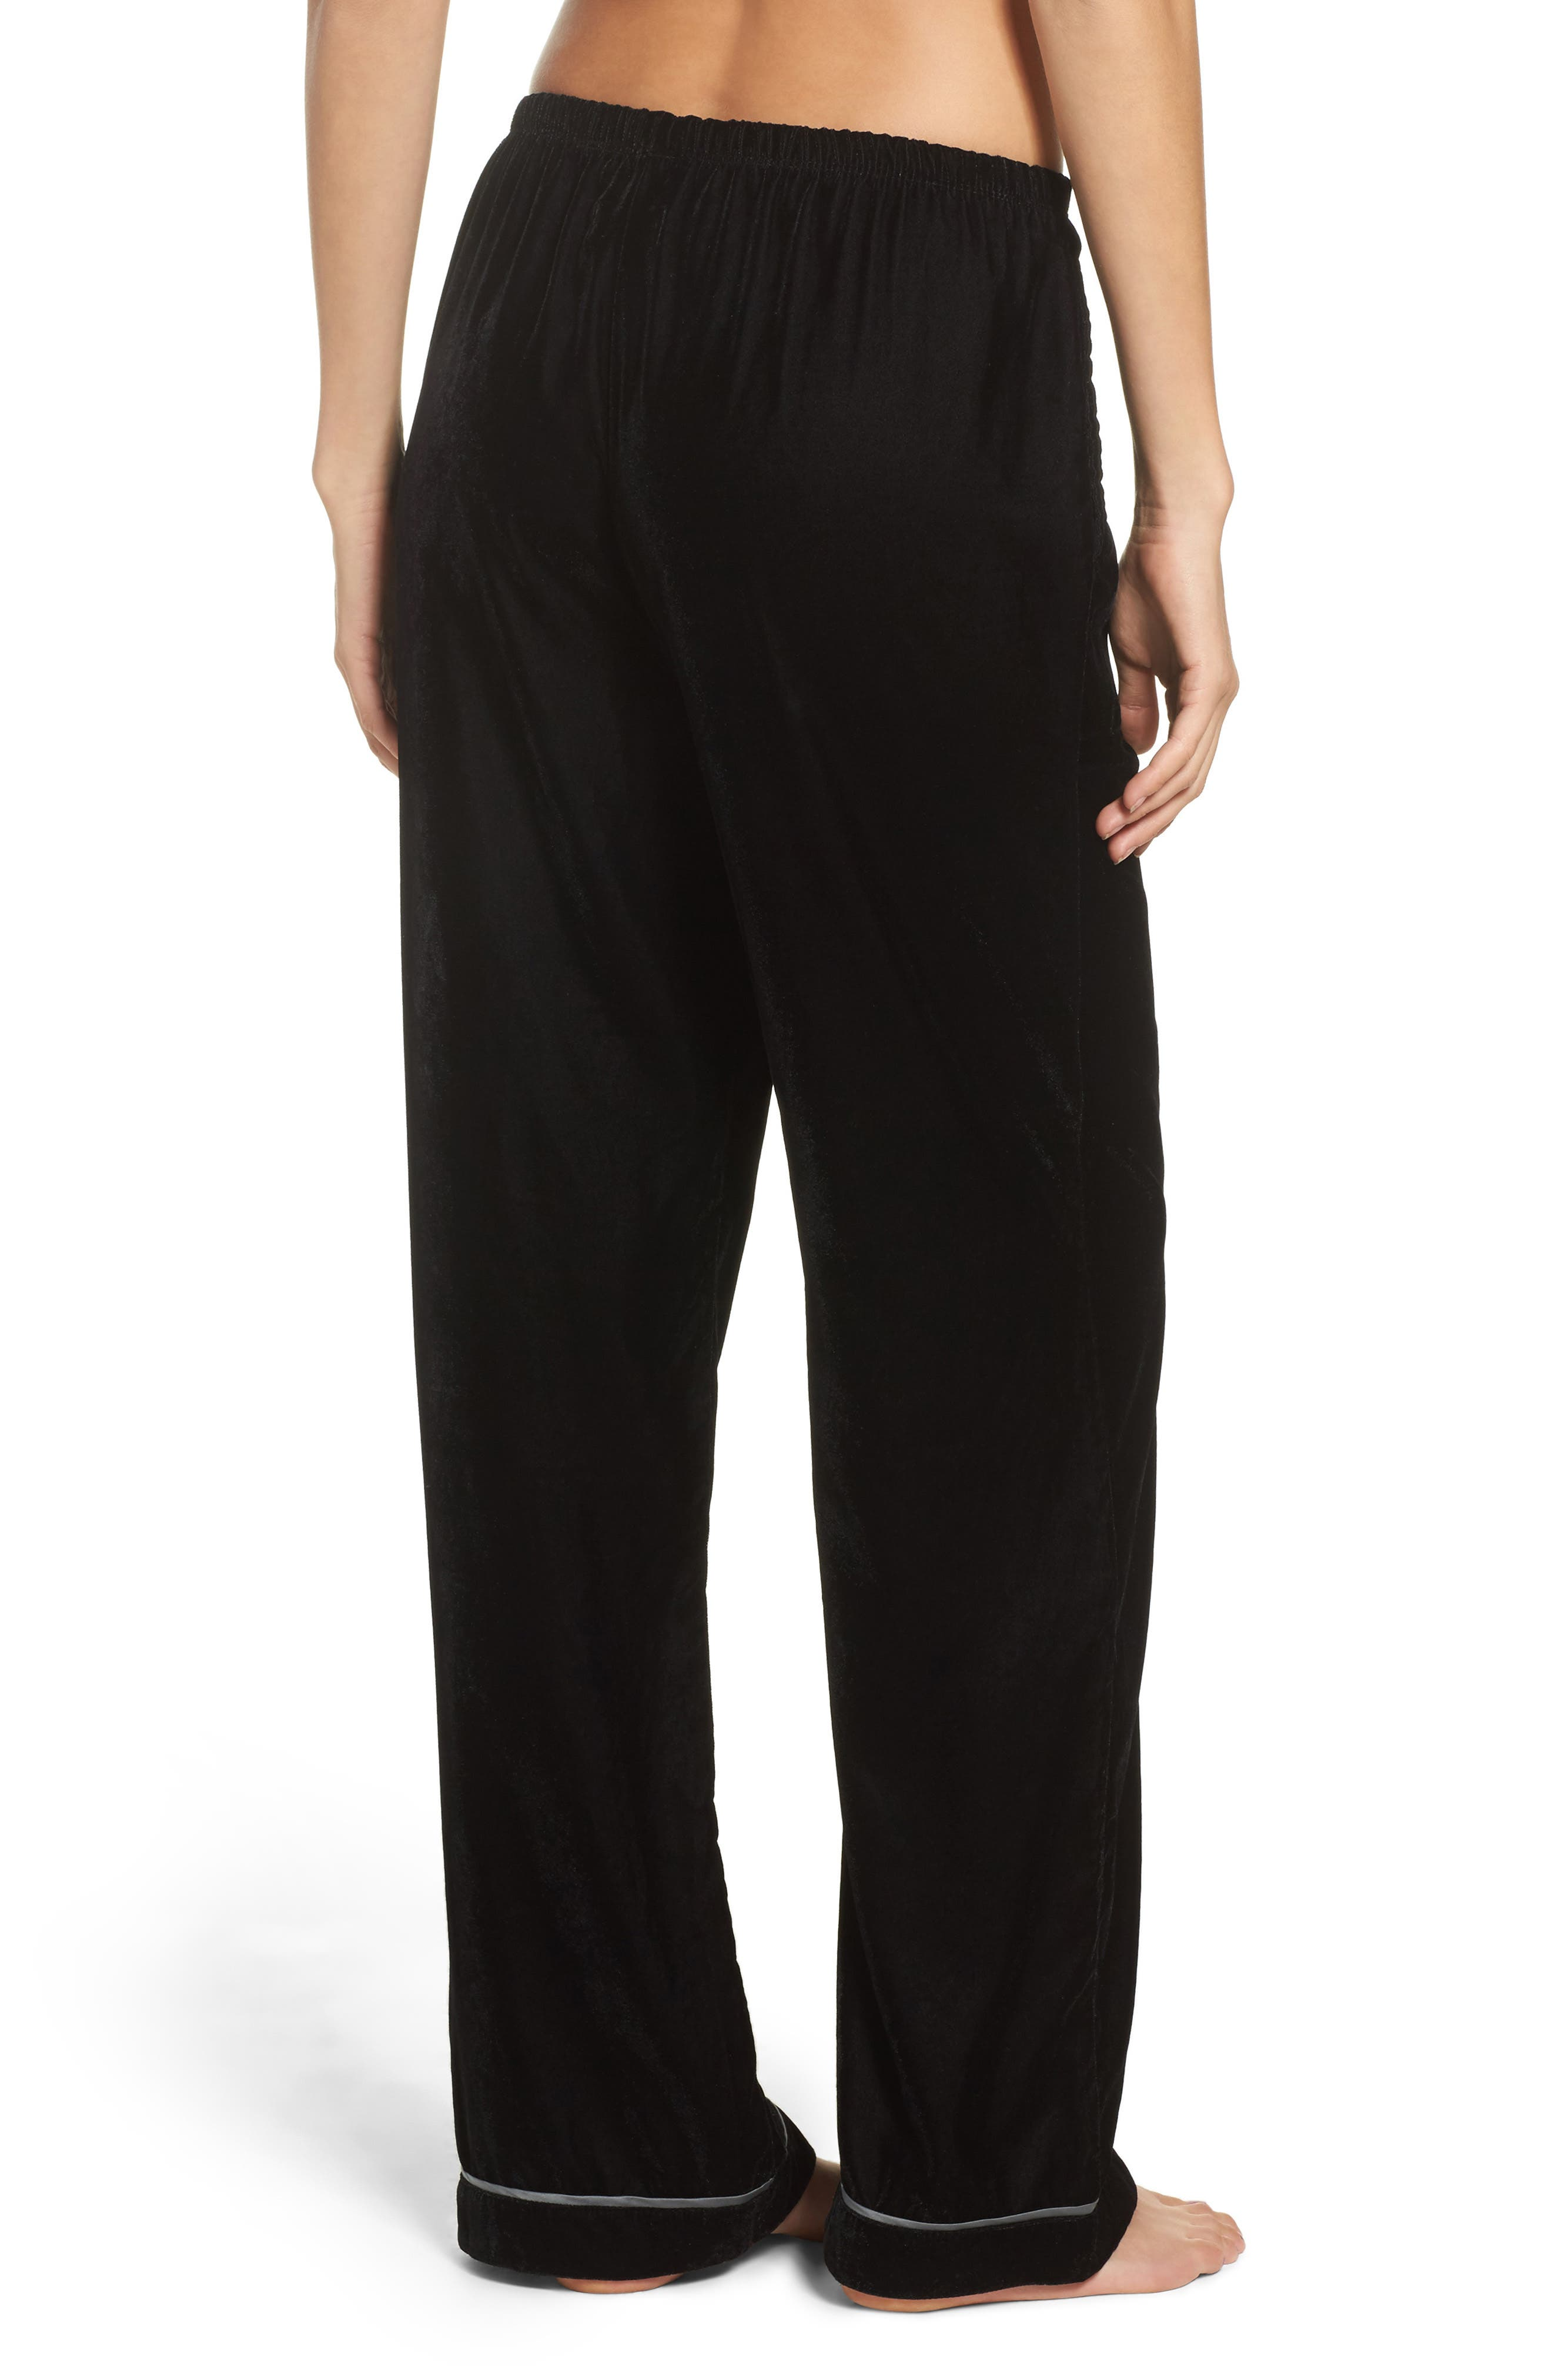 Velvet Pajama Pants,                             Alternate thumbnail 2, color,                             001